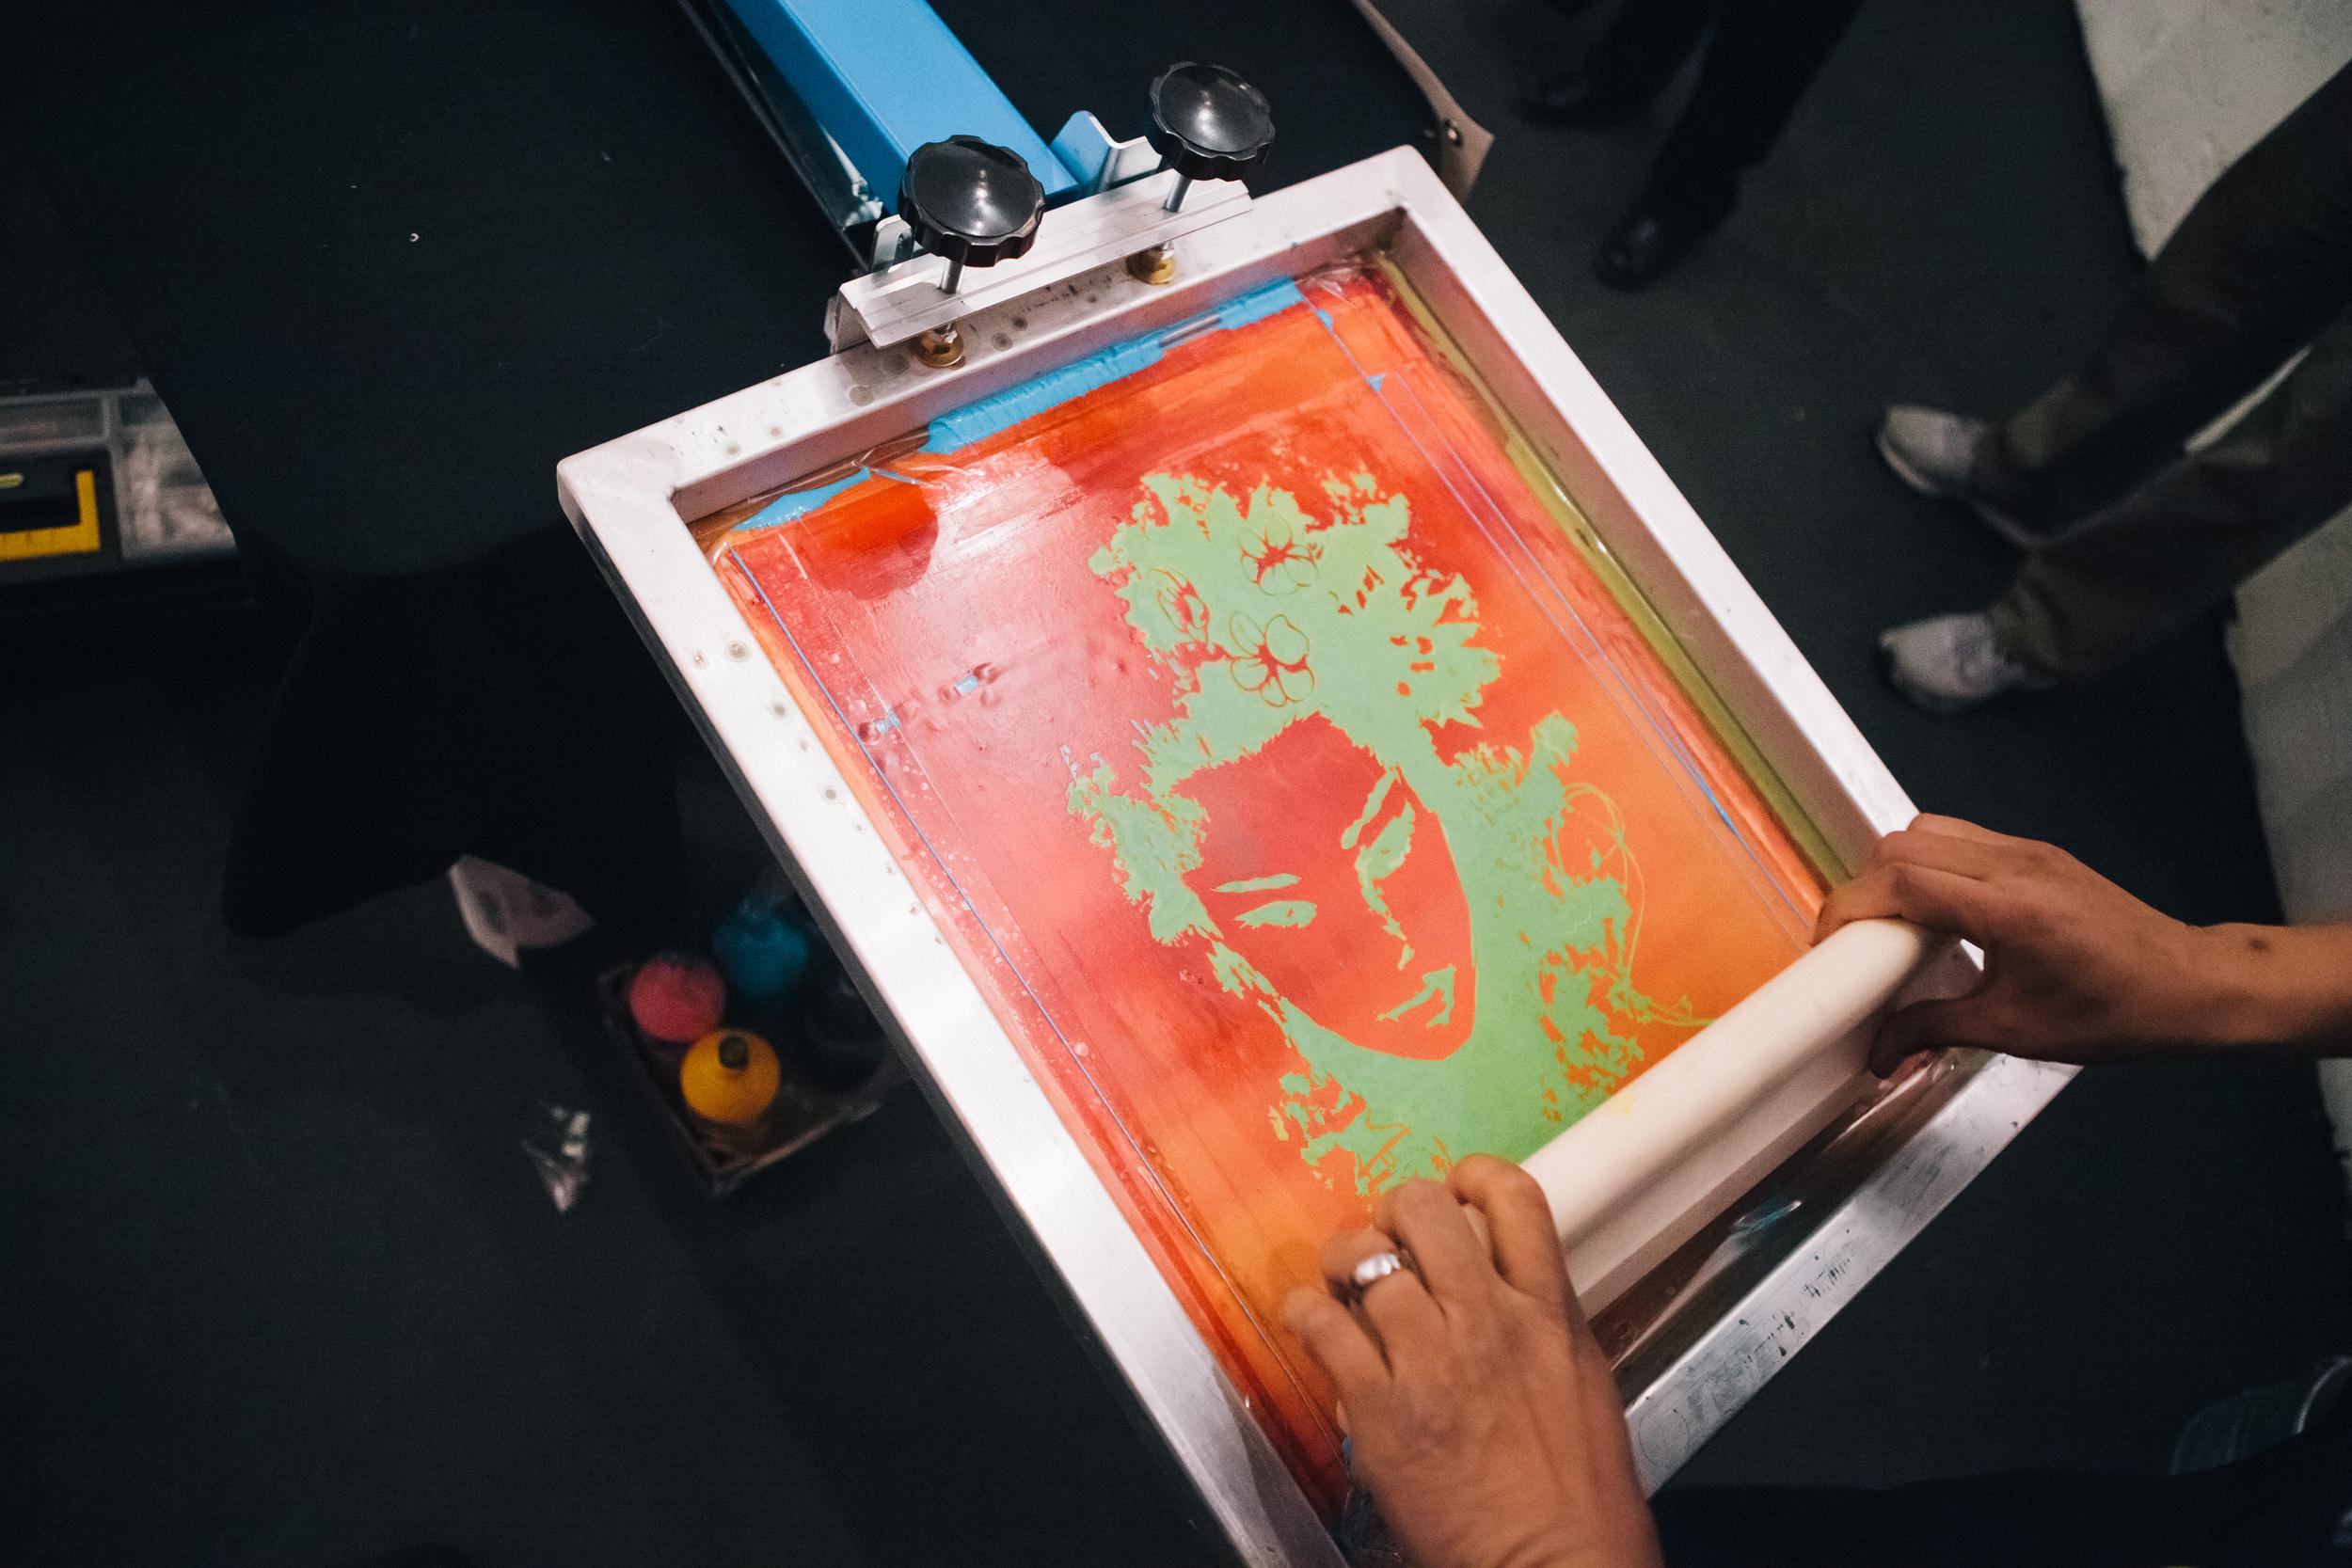 Soul-and-ink-screenprinting-erika-layne-photography-2776.jpg